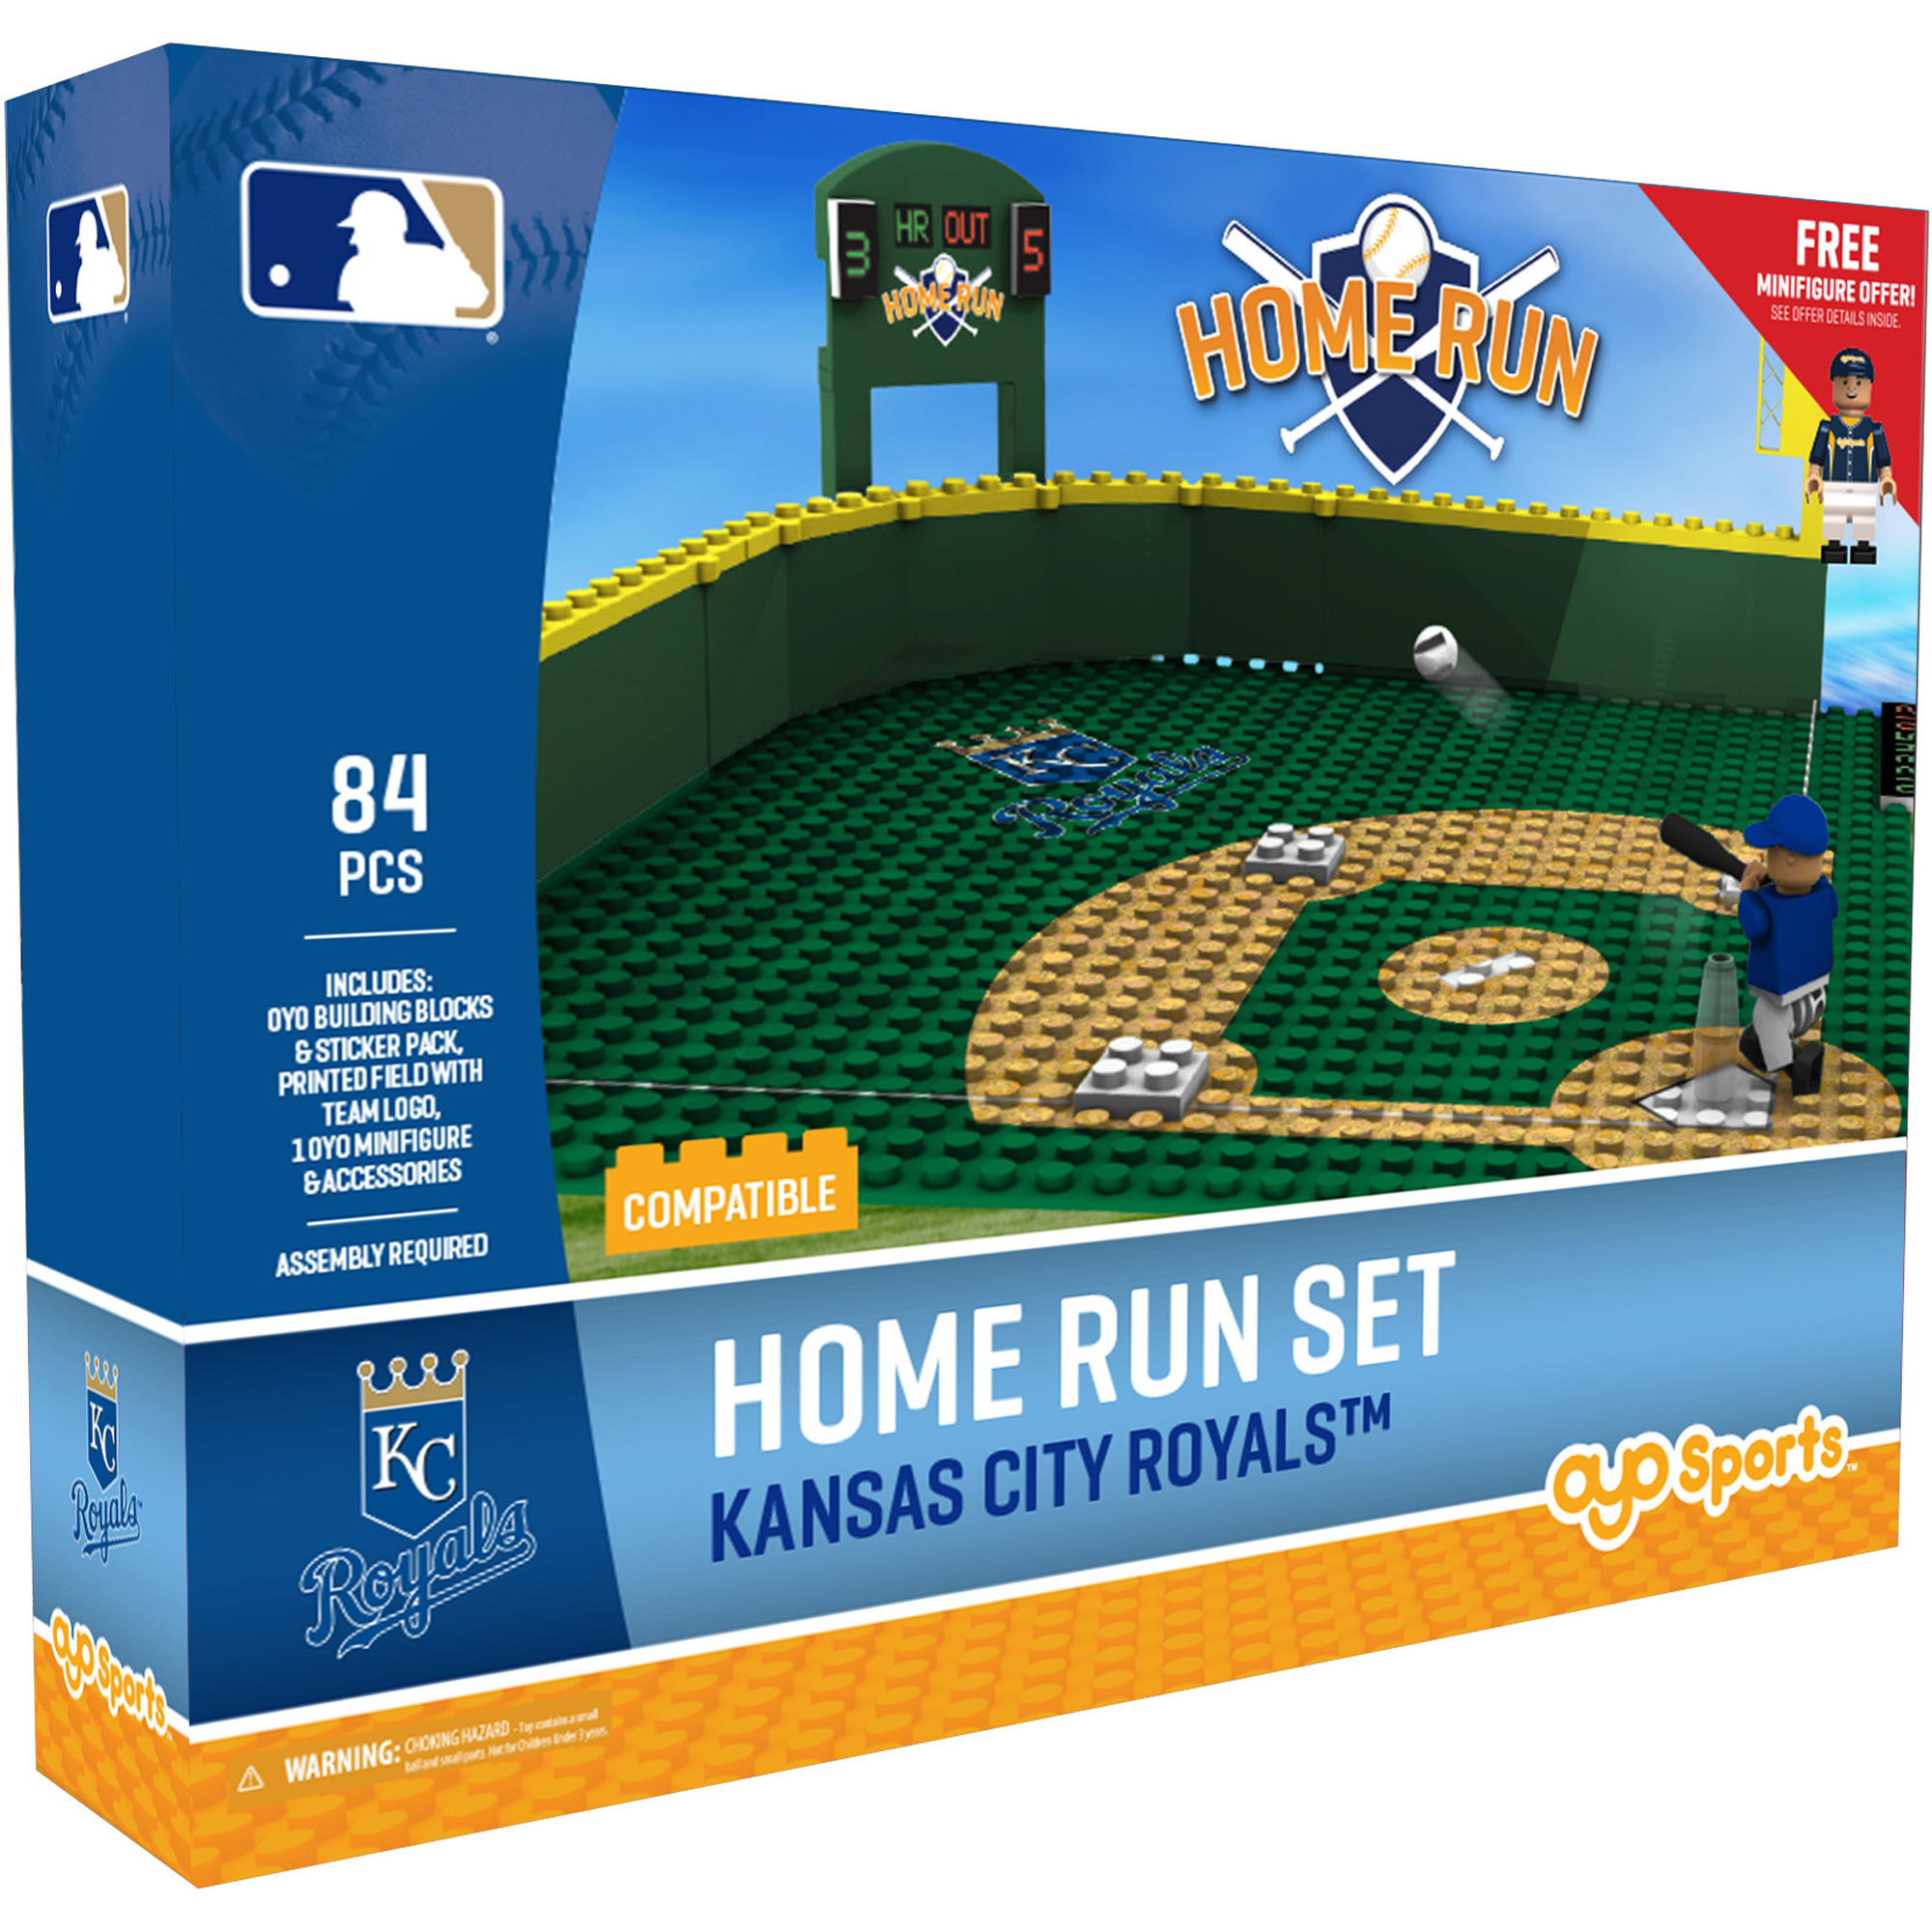 Kansas City Royals OYO Sports Home Run Derby Set - No Size